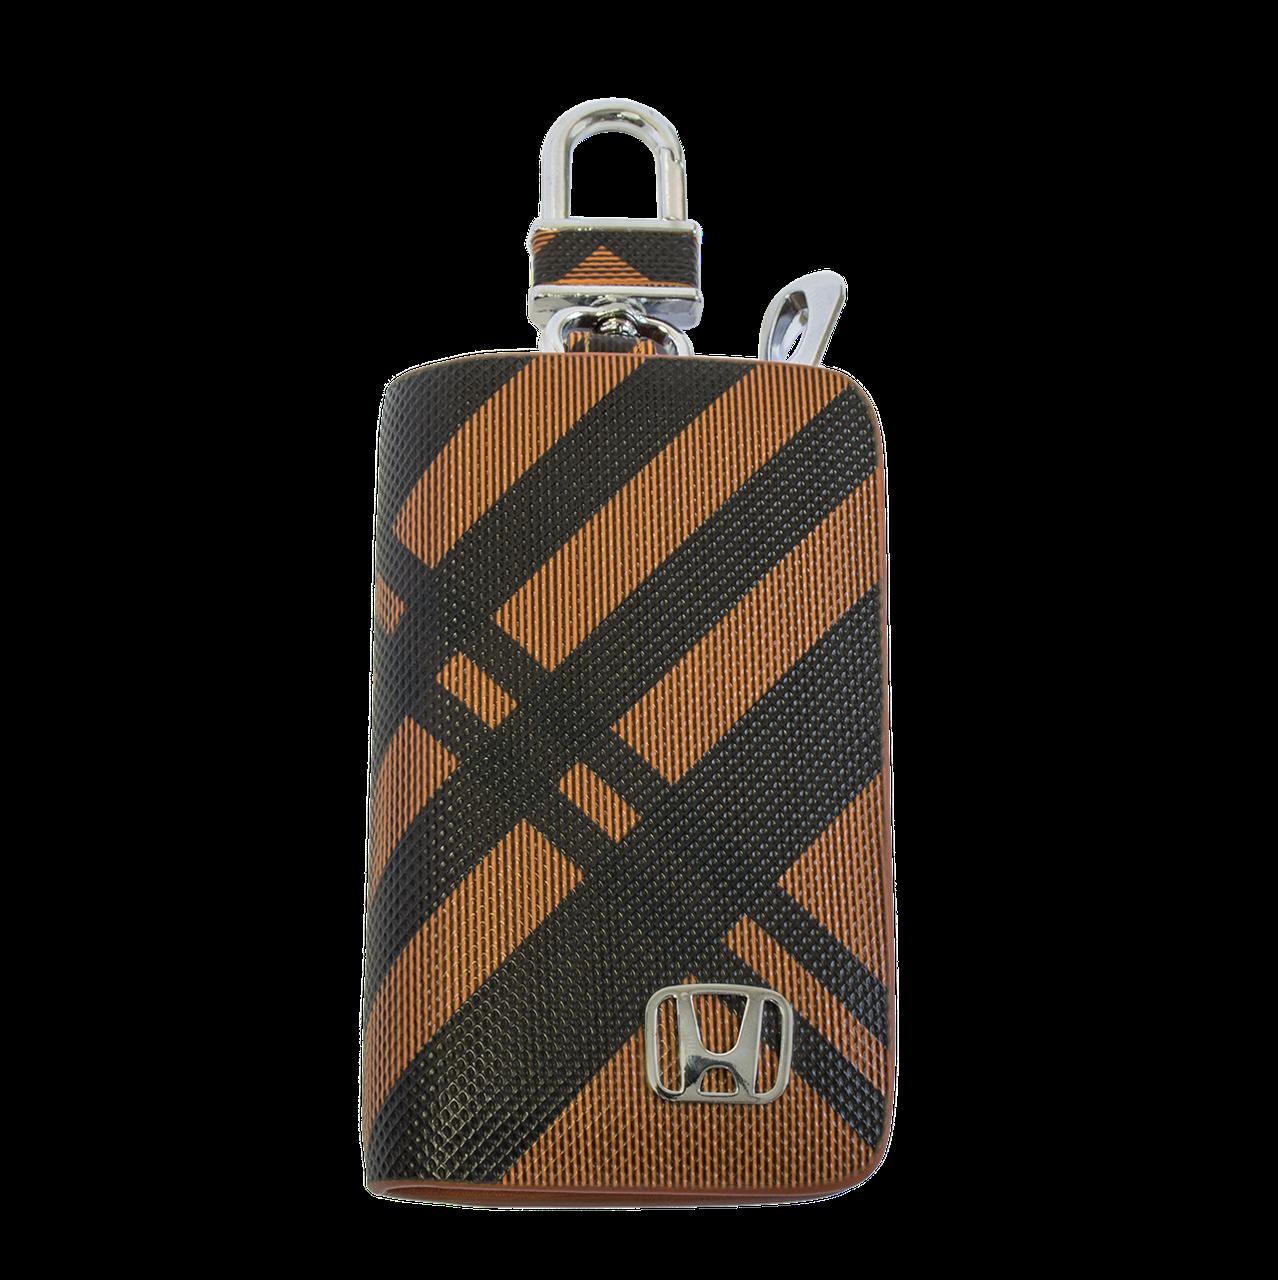 Ключница Carss с логотипом HONDA 08014 карбон коричневый